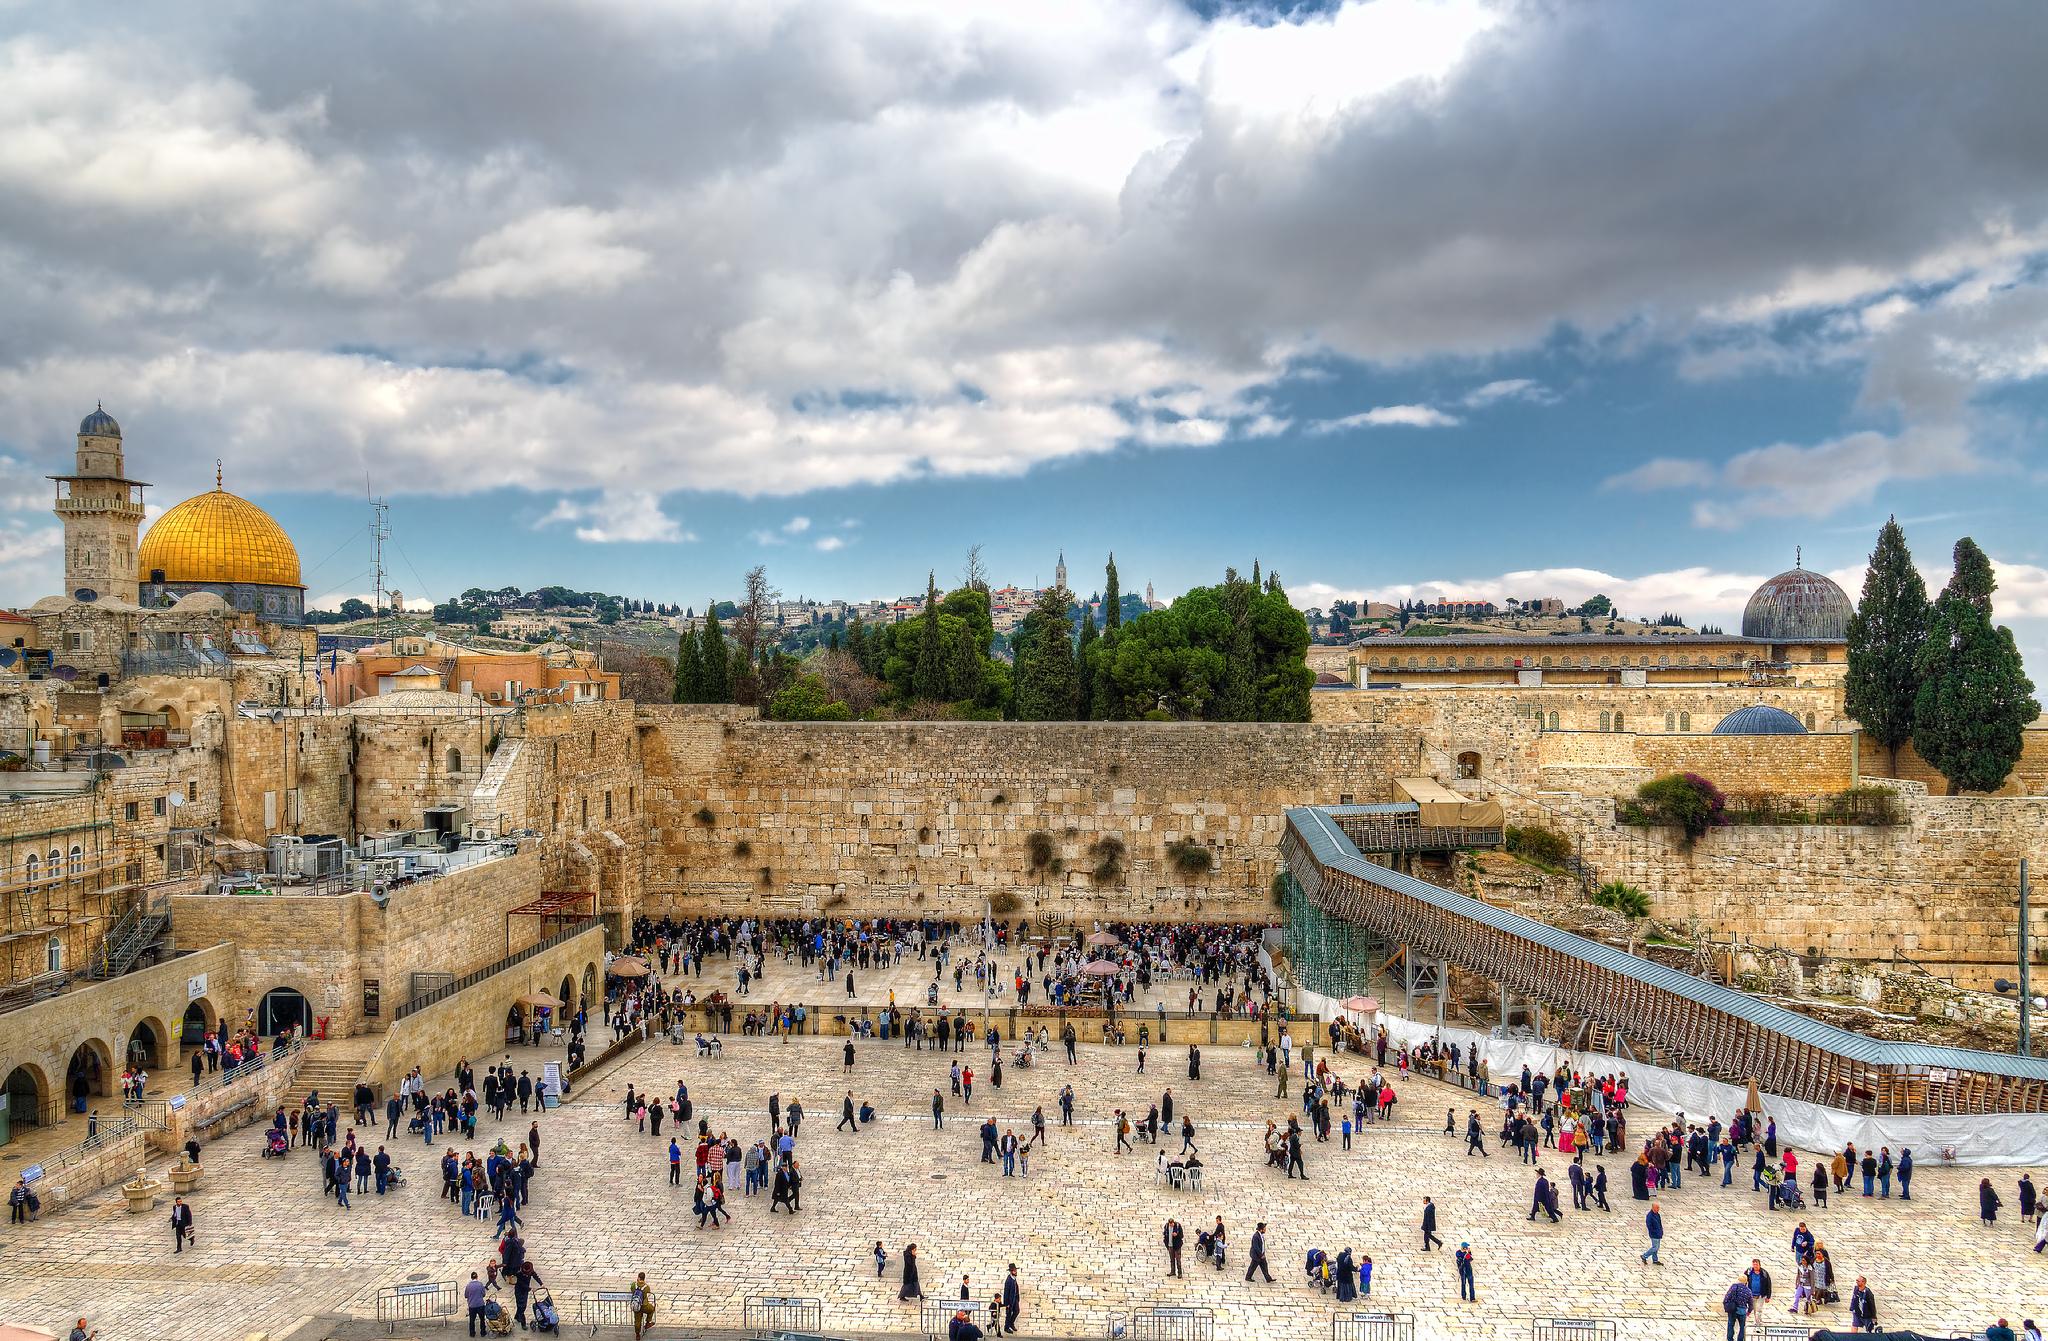 The-Farthest-Mosque-al-Masjid-al-Aqsa-Bayt-al-Muqaddas-in-Jerusalem